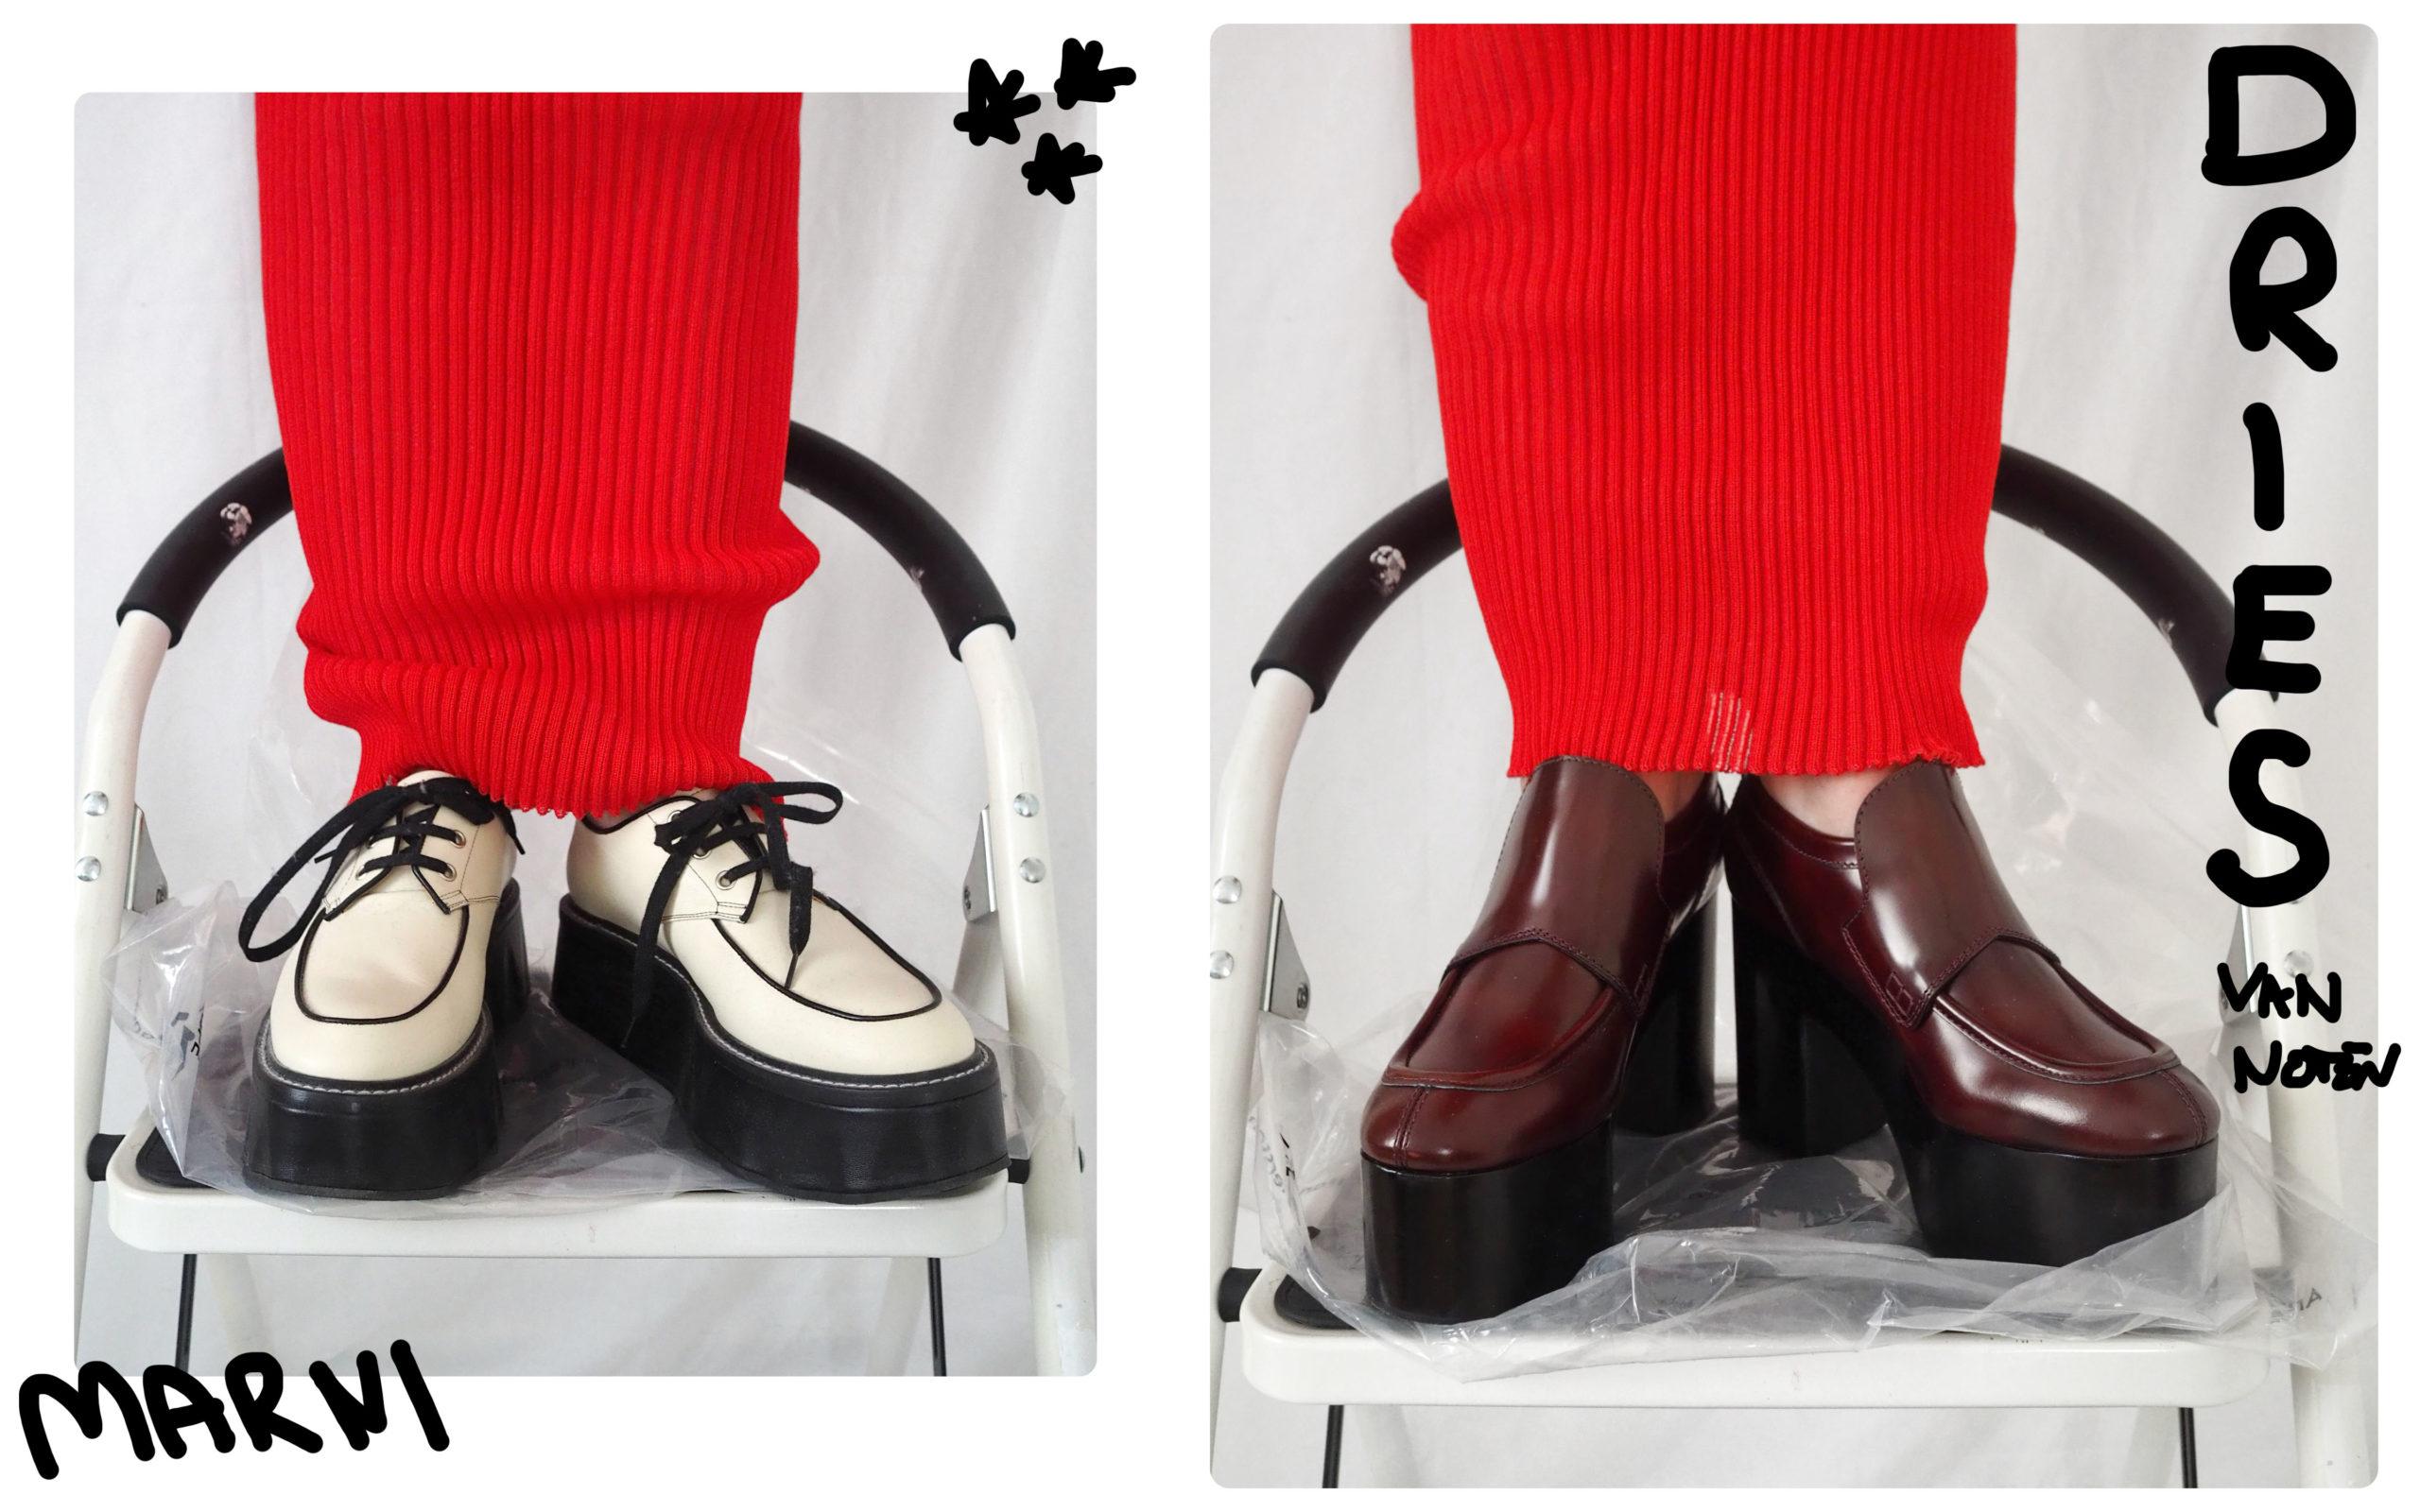 White Marni Platform shoes, Burgundy Dries van Noten Platform Heels